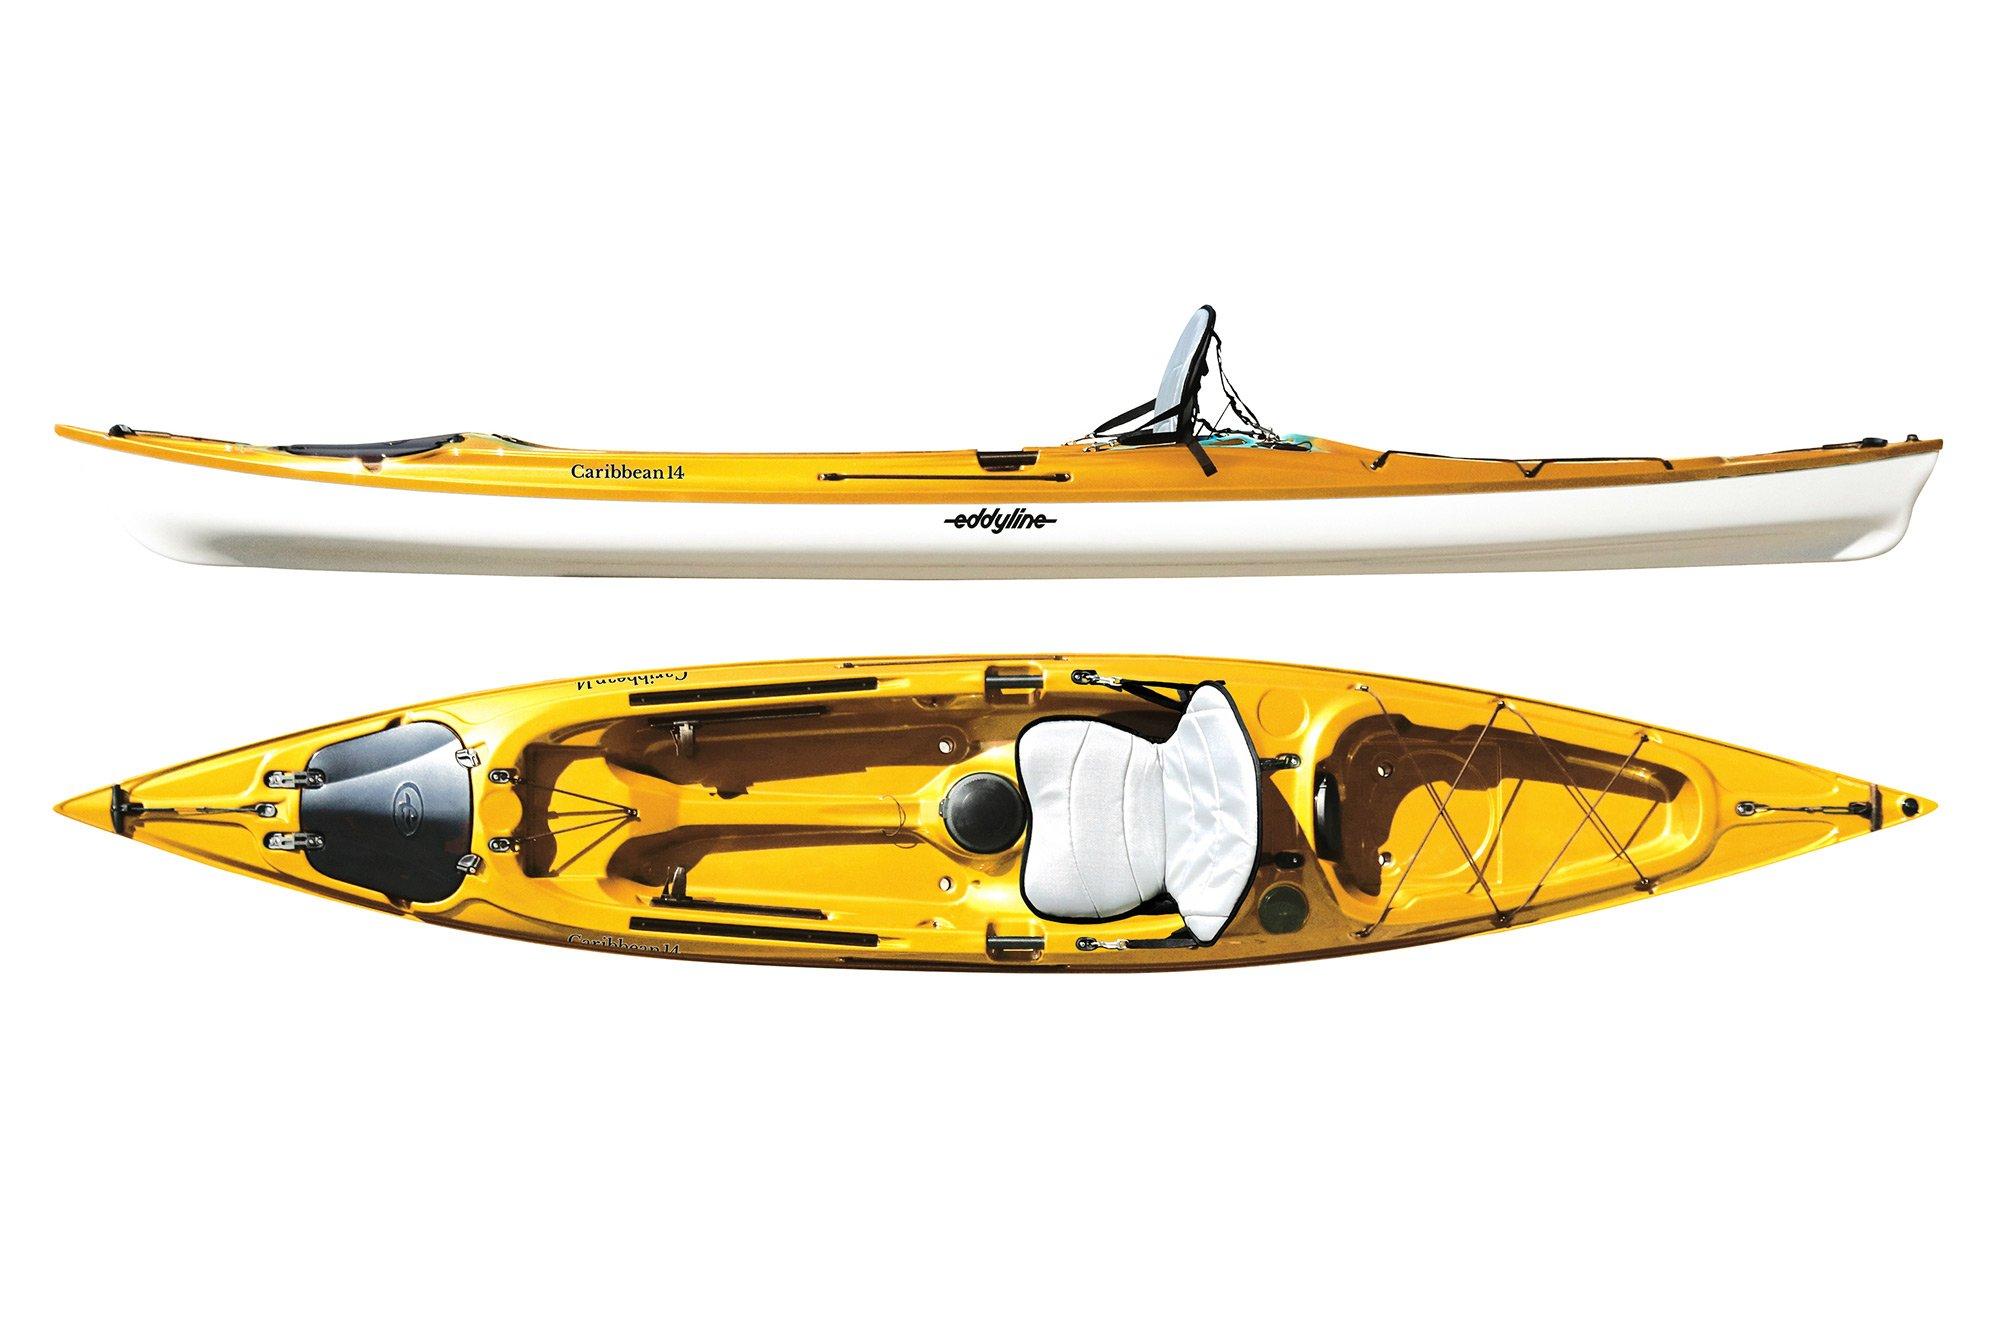 Eddyline Caribbean 14 Sit-On-Top Kayak - Yellow / White